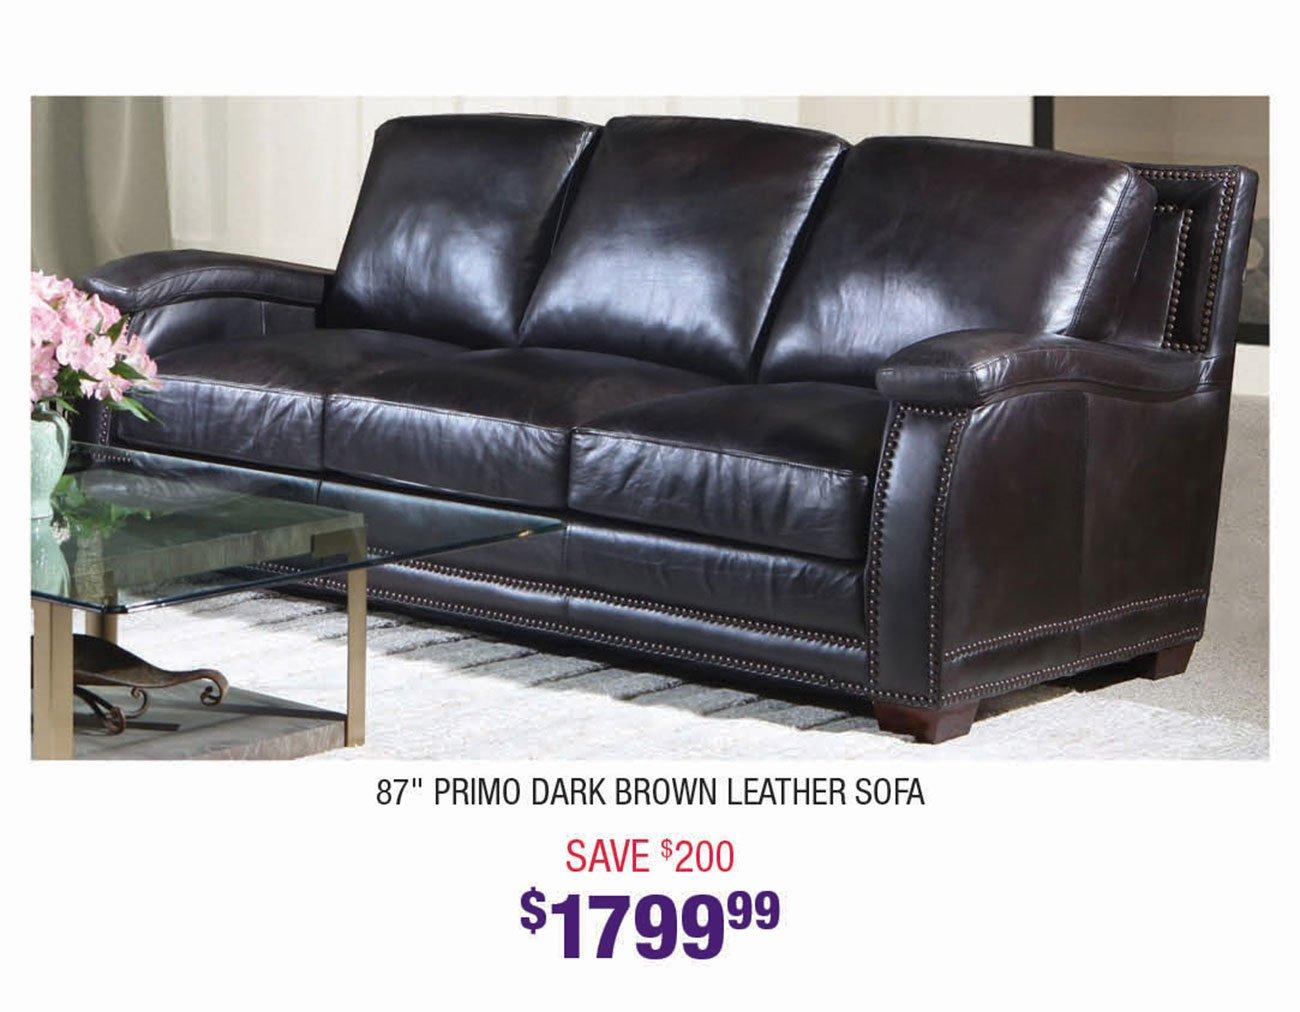 Primo-Dark-Brown-Leather-Sofa